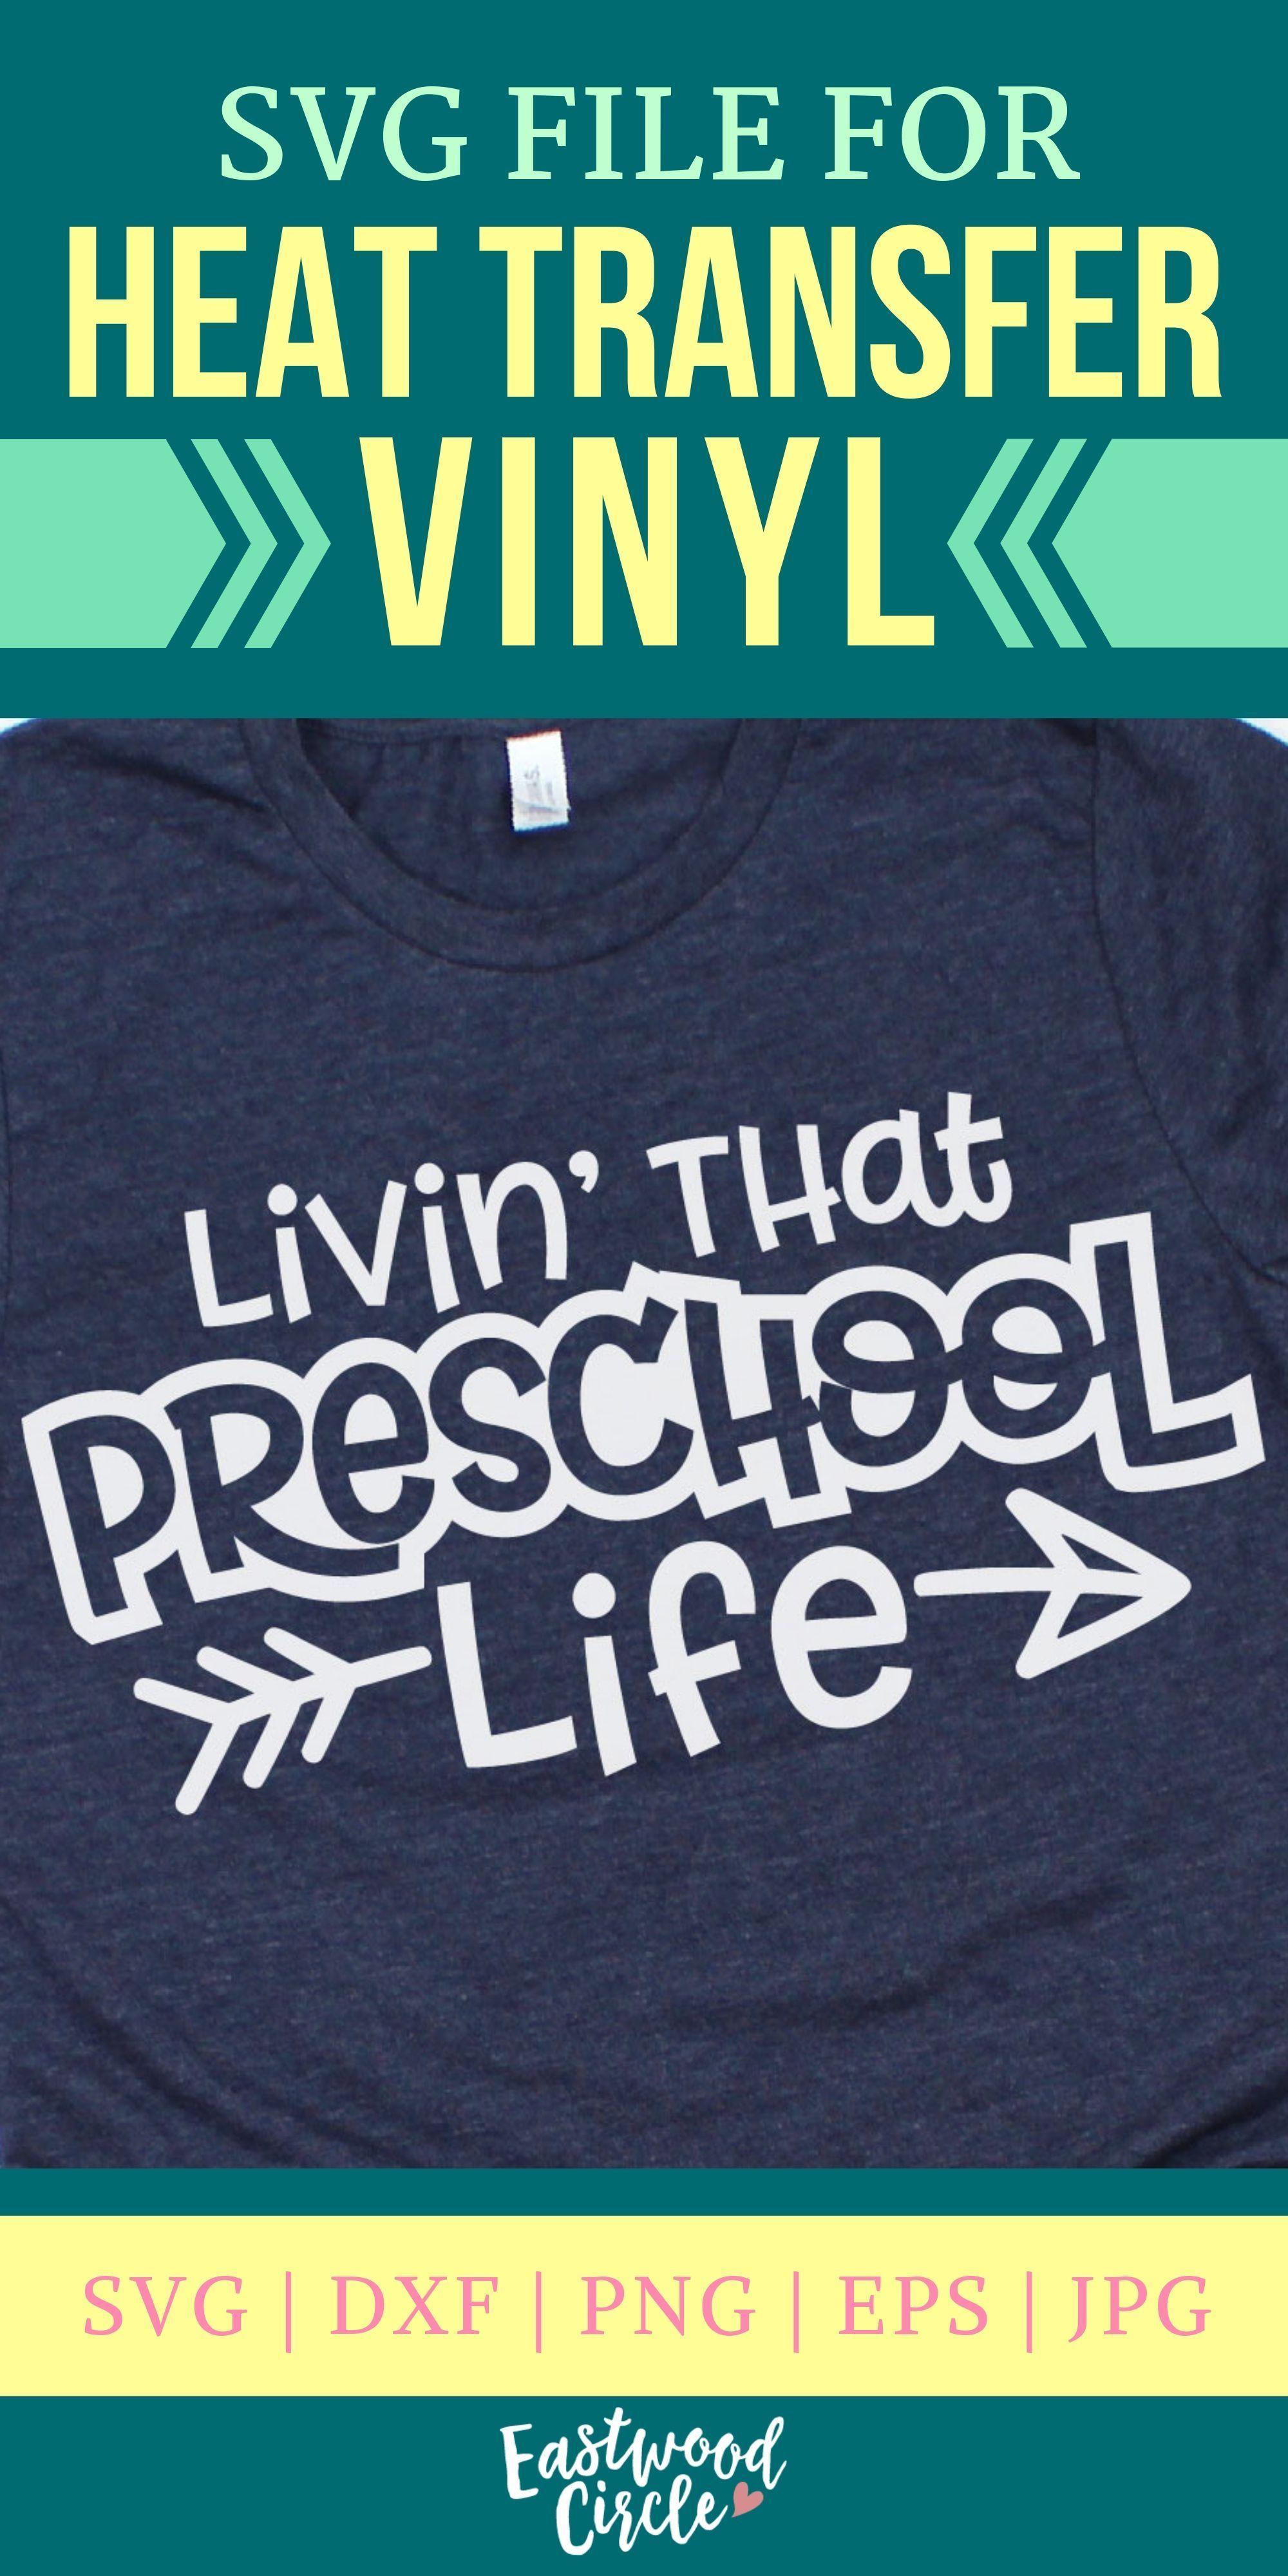 Livin That Preschool Life svg Preschool svg School svg